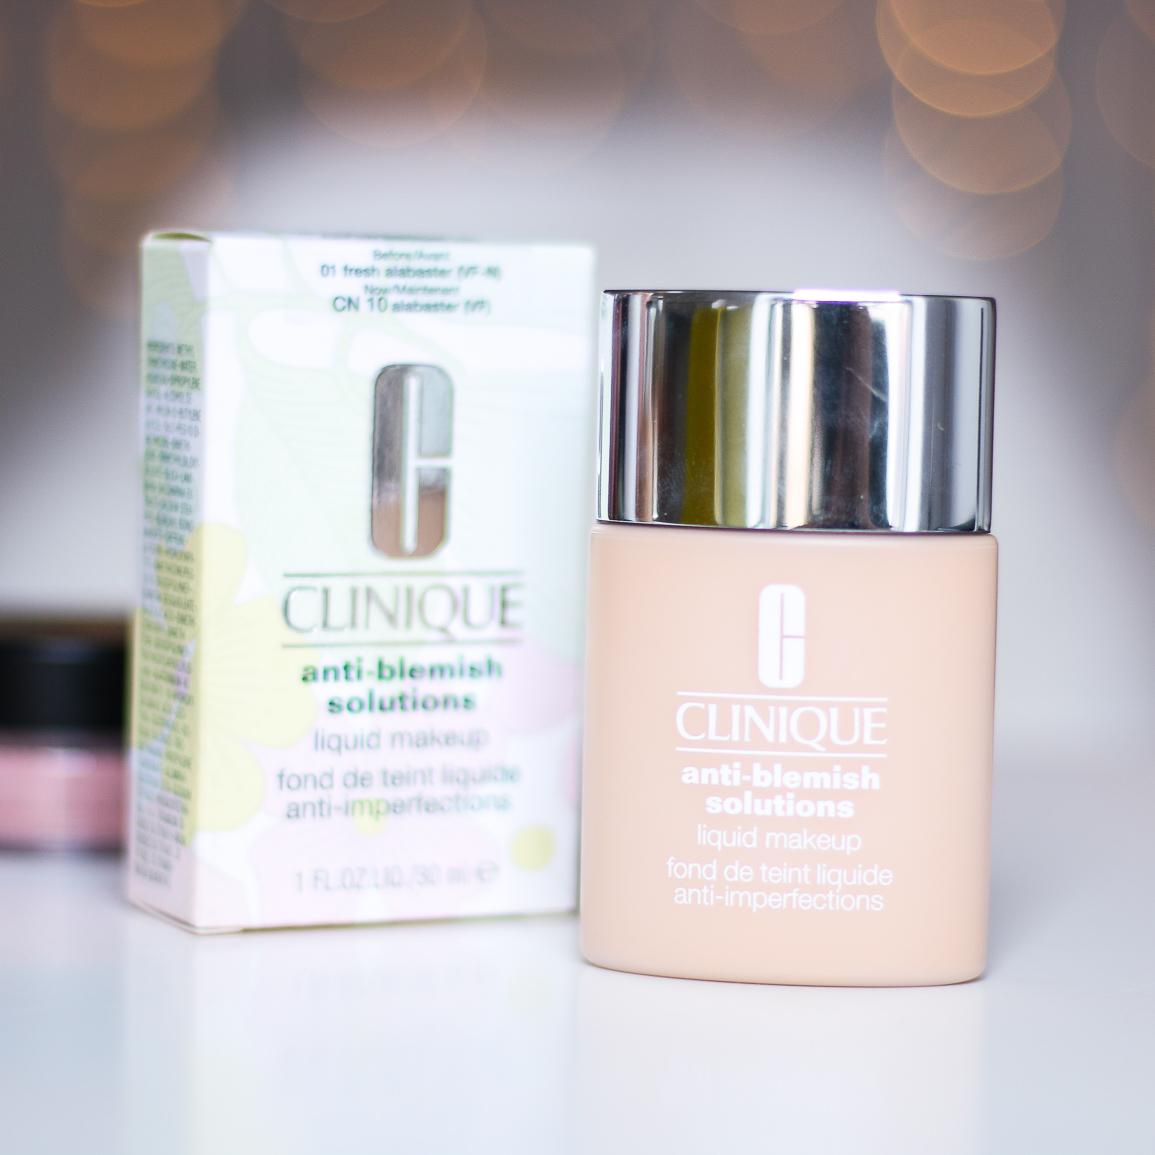 podklad-clinique-anti-blemish-solutions-opakowanie